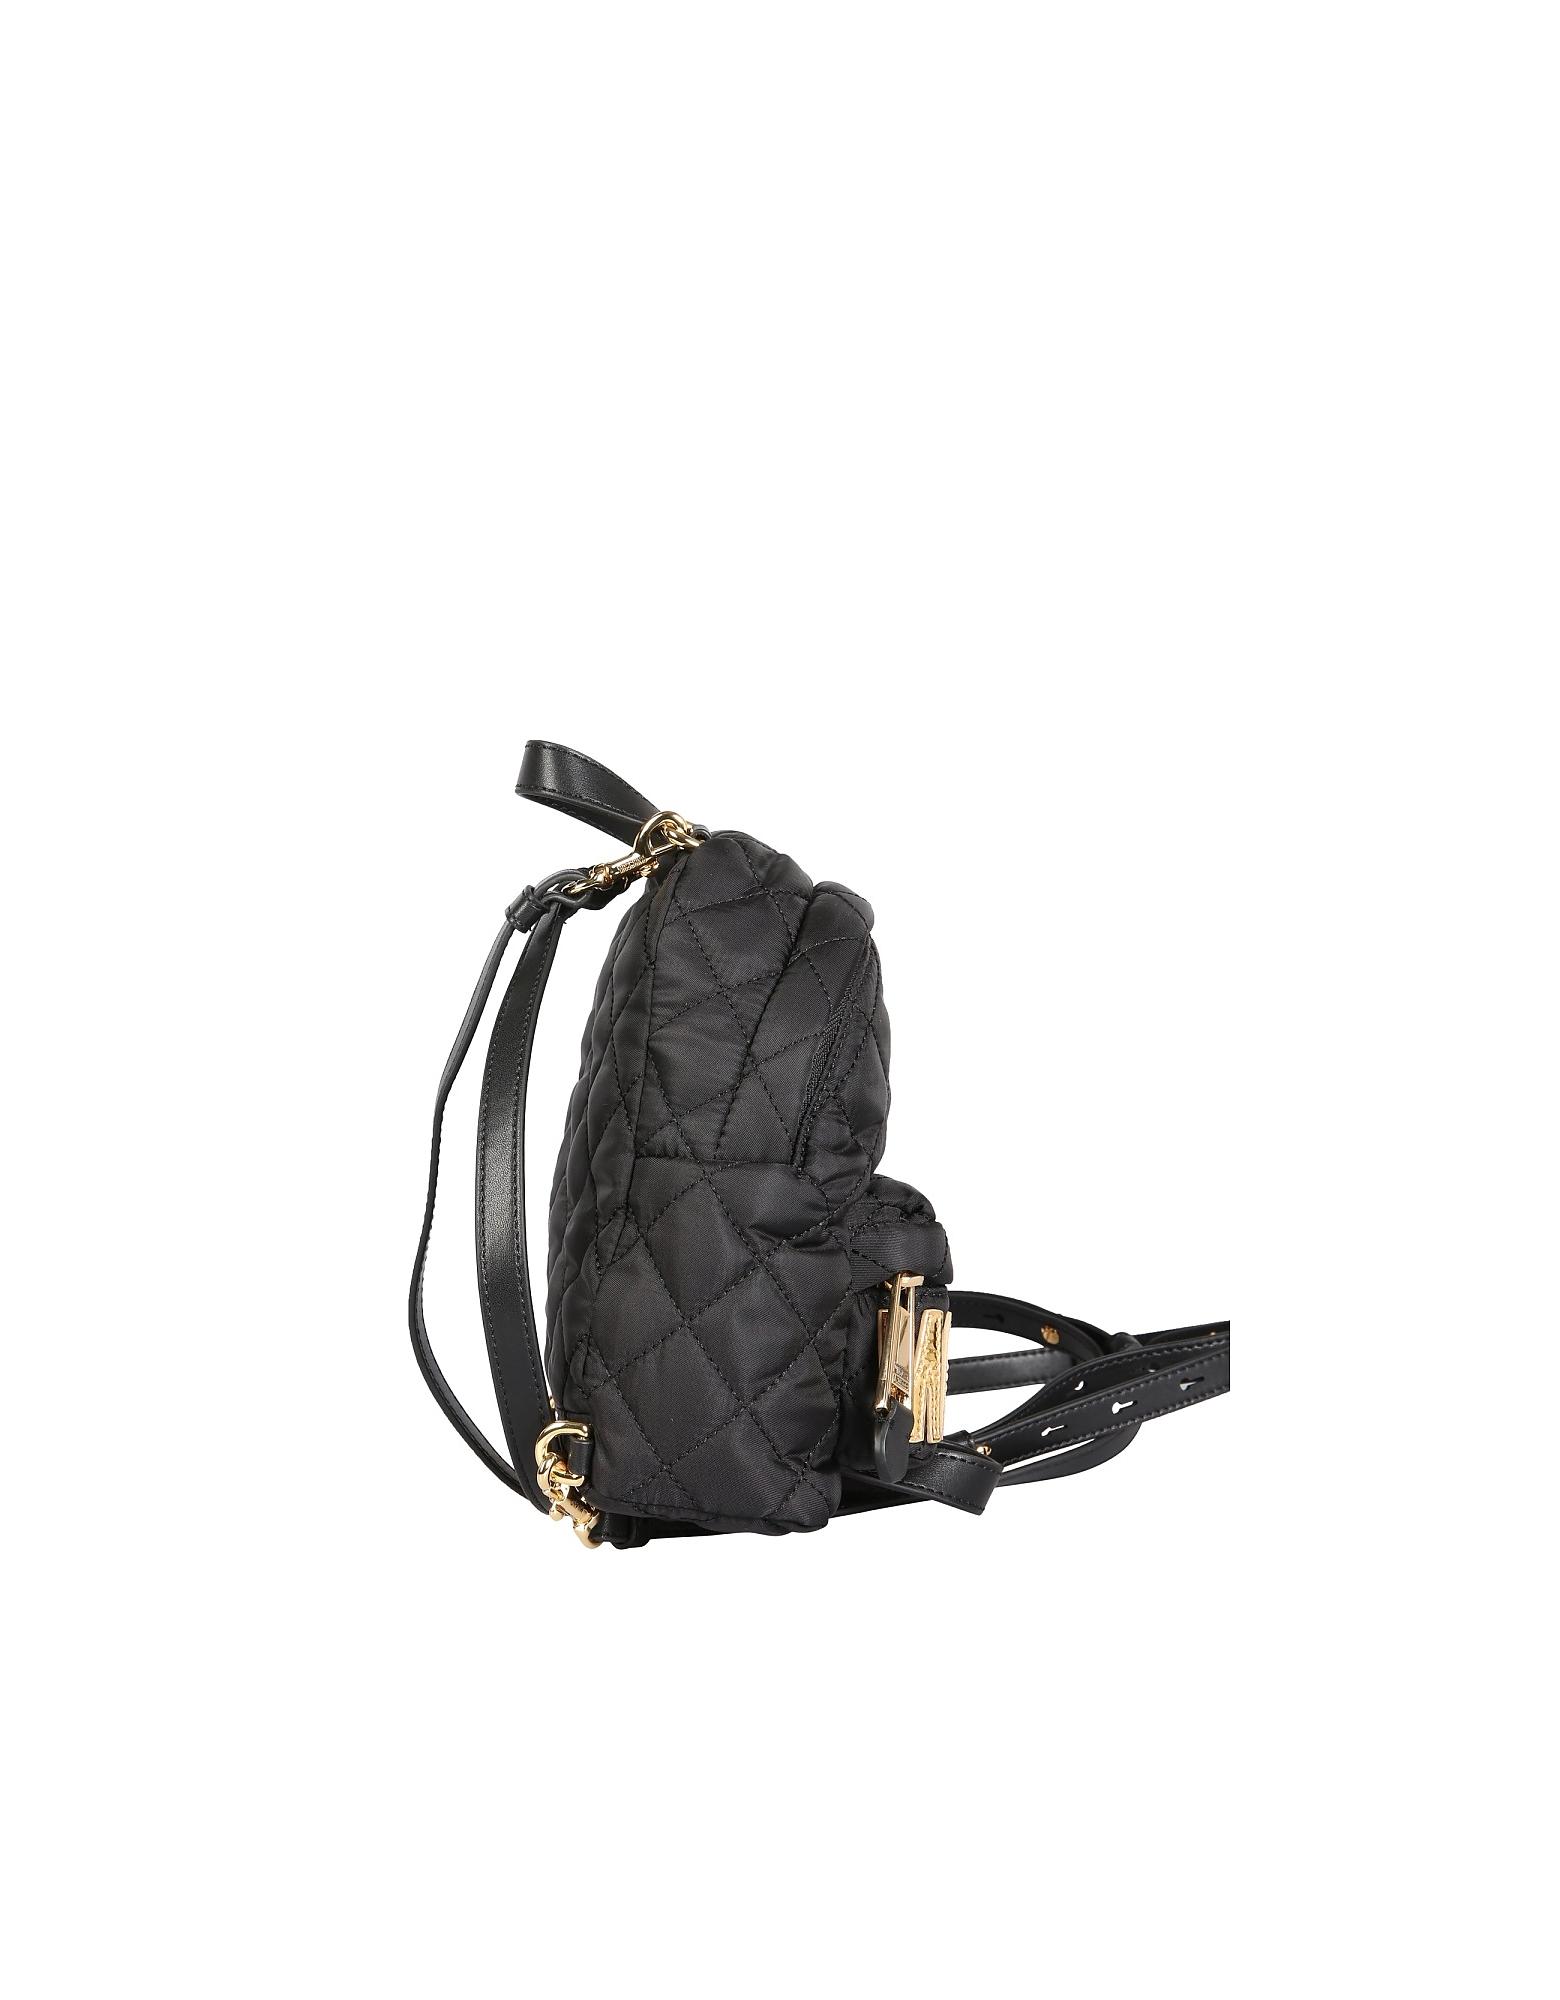 Moschino Designer Handbags, Backpack With Logo